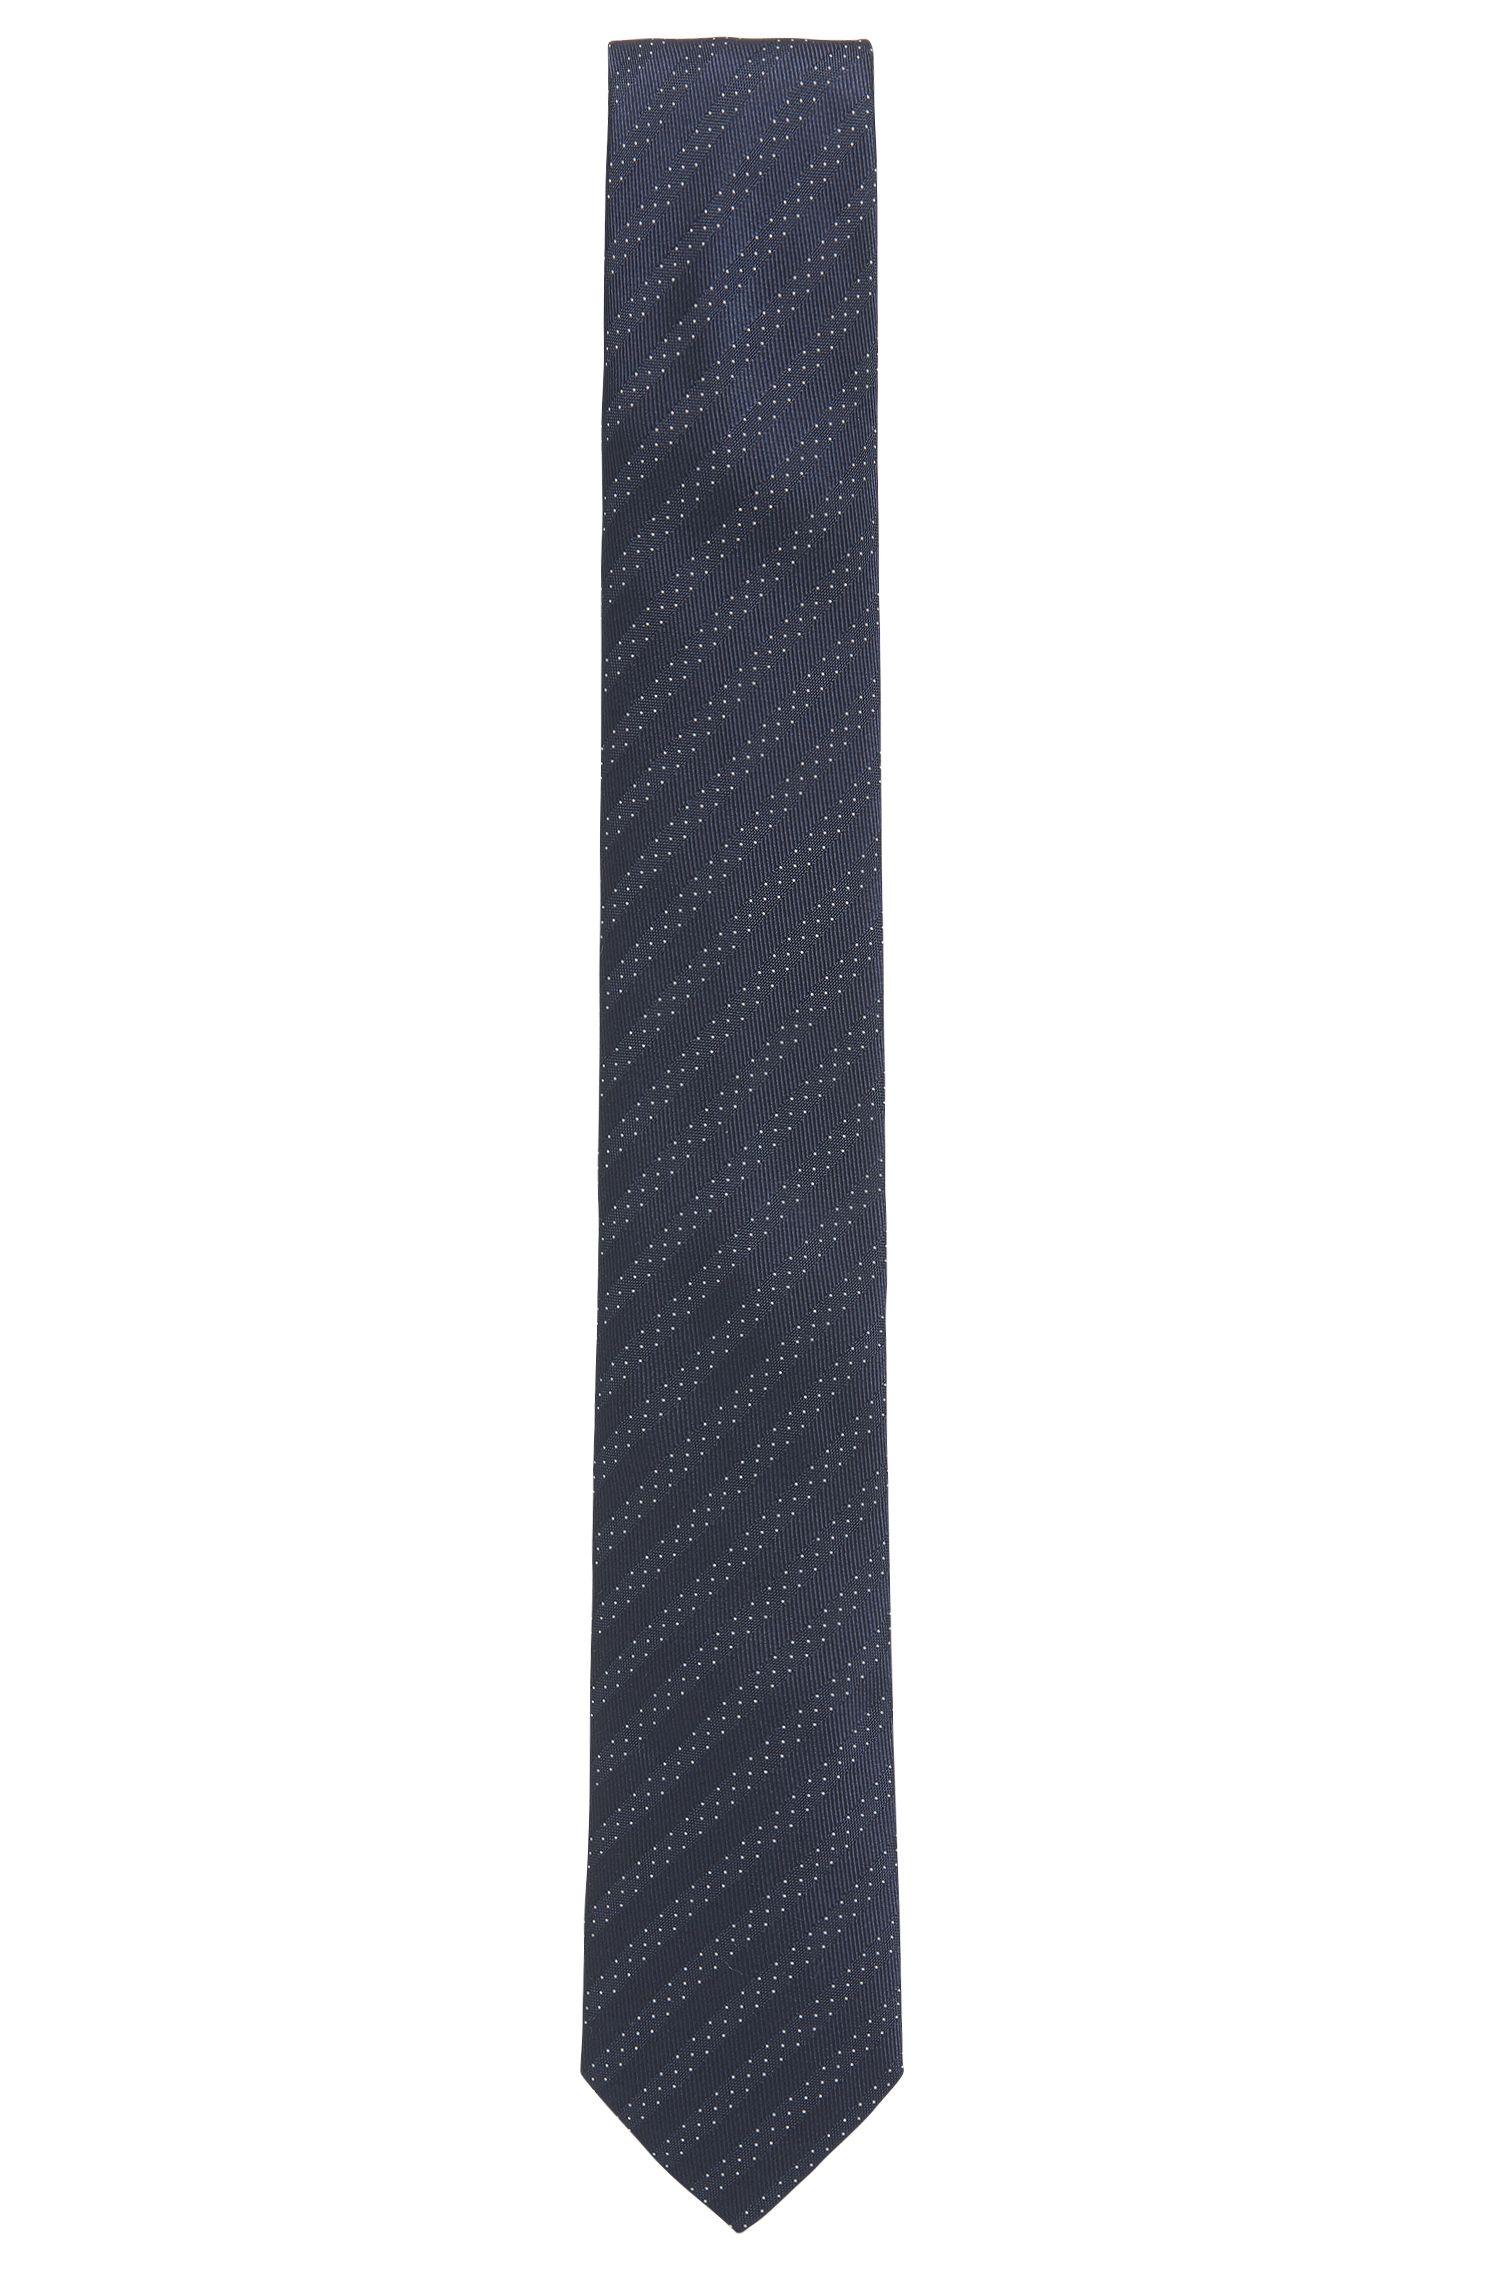 Micro-Dot Striped Italian Silk Slim Tie, Dark Blue